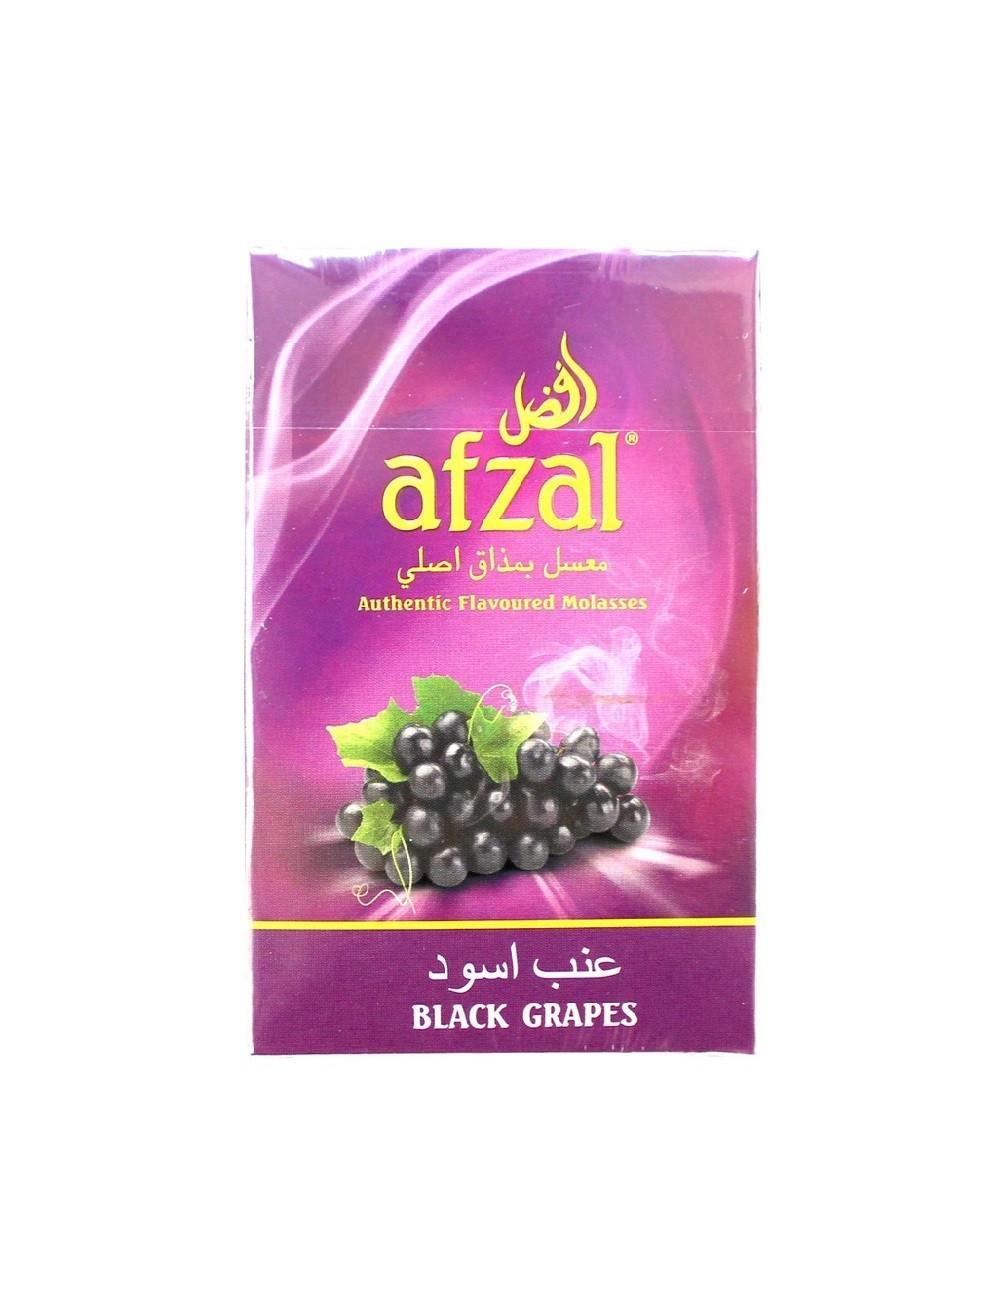 Black grapes